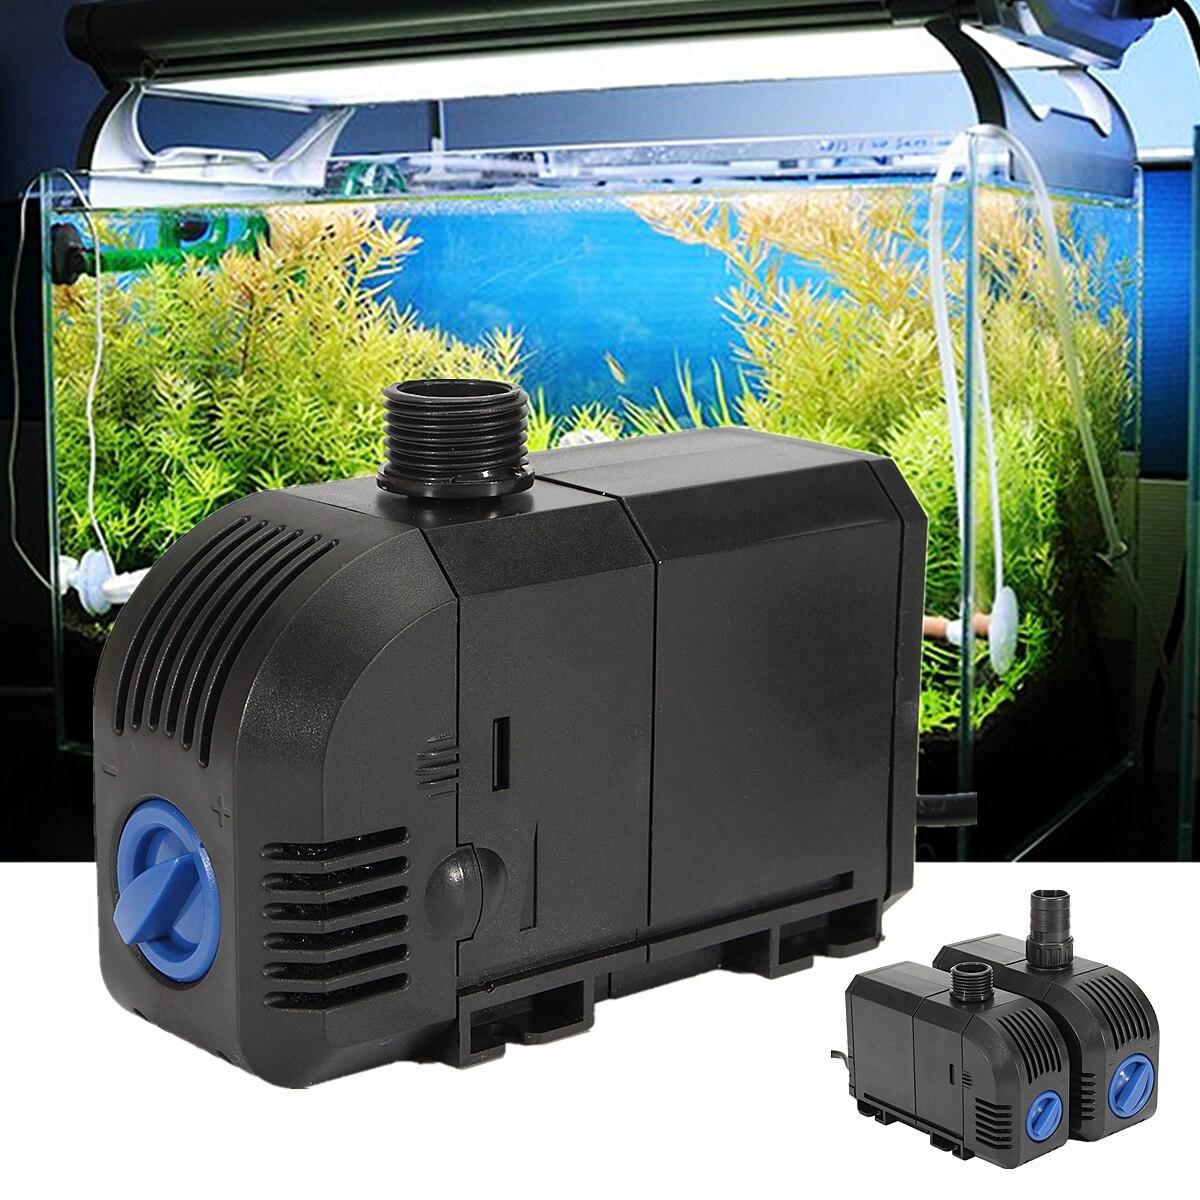 20W/25W AC 220-240V Electric Submersible Water Pump Aquarium Fish Tank Pool Pond Garden Fountain Water Pumps 900-1500L/H 12w submersible aquarium water pump 220 240v 50hz